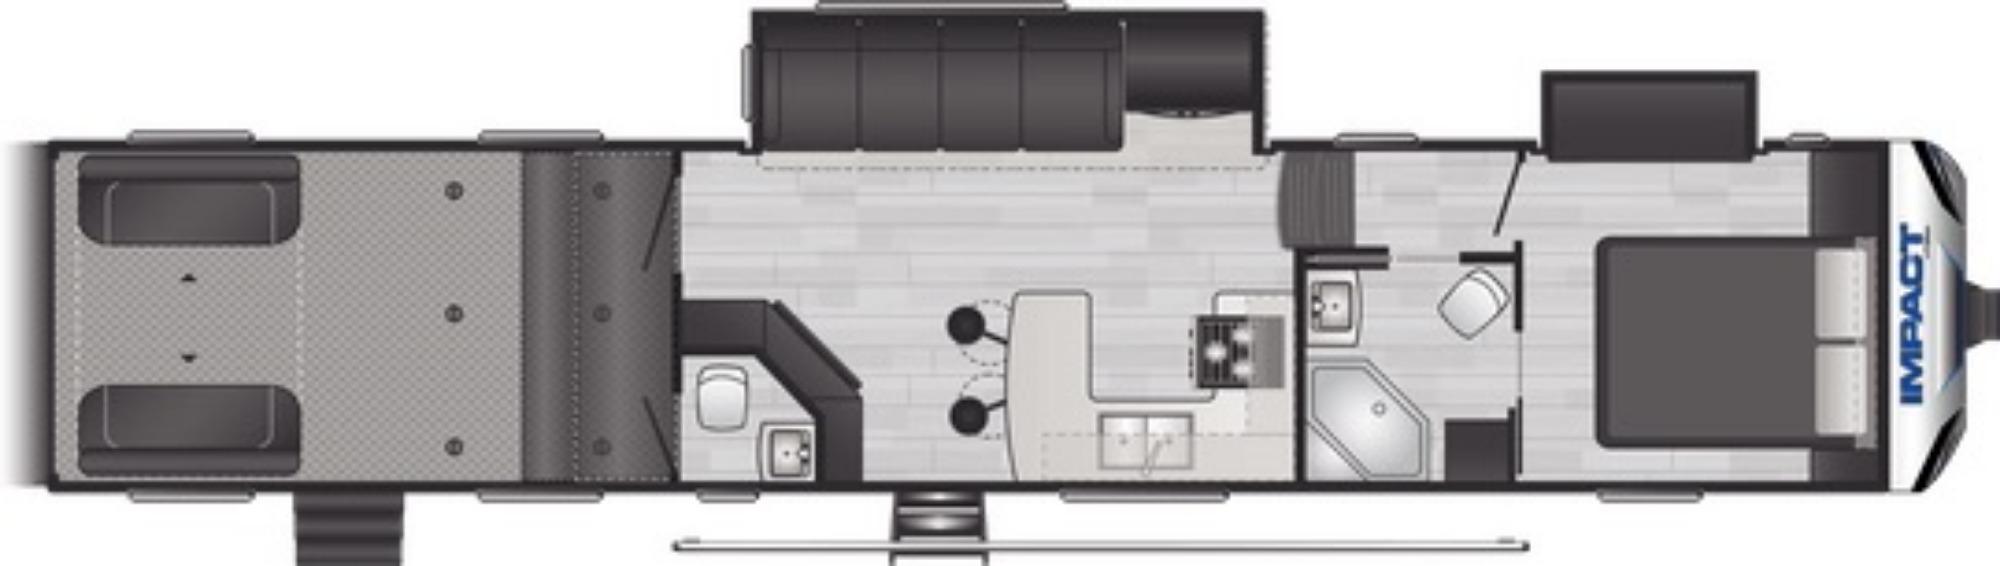 View Floor Plan for 2021 KEYSTONE IMPACT 415